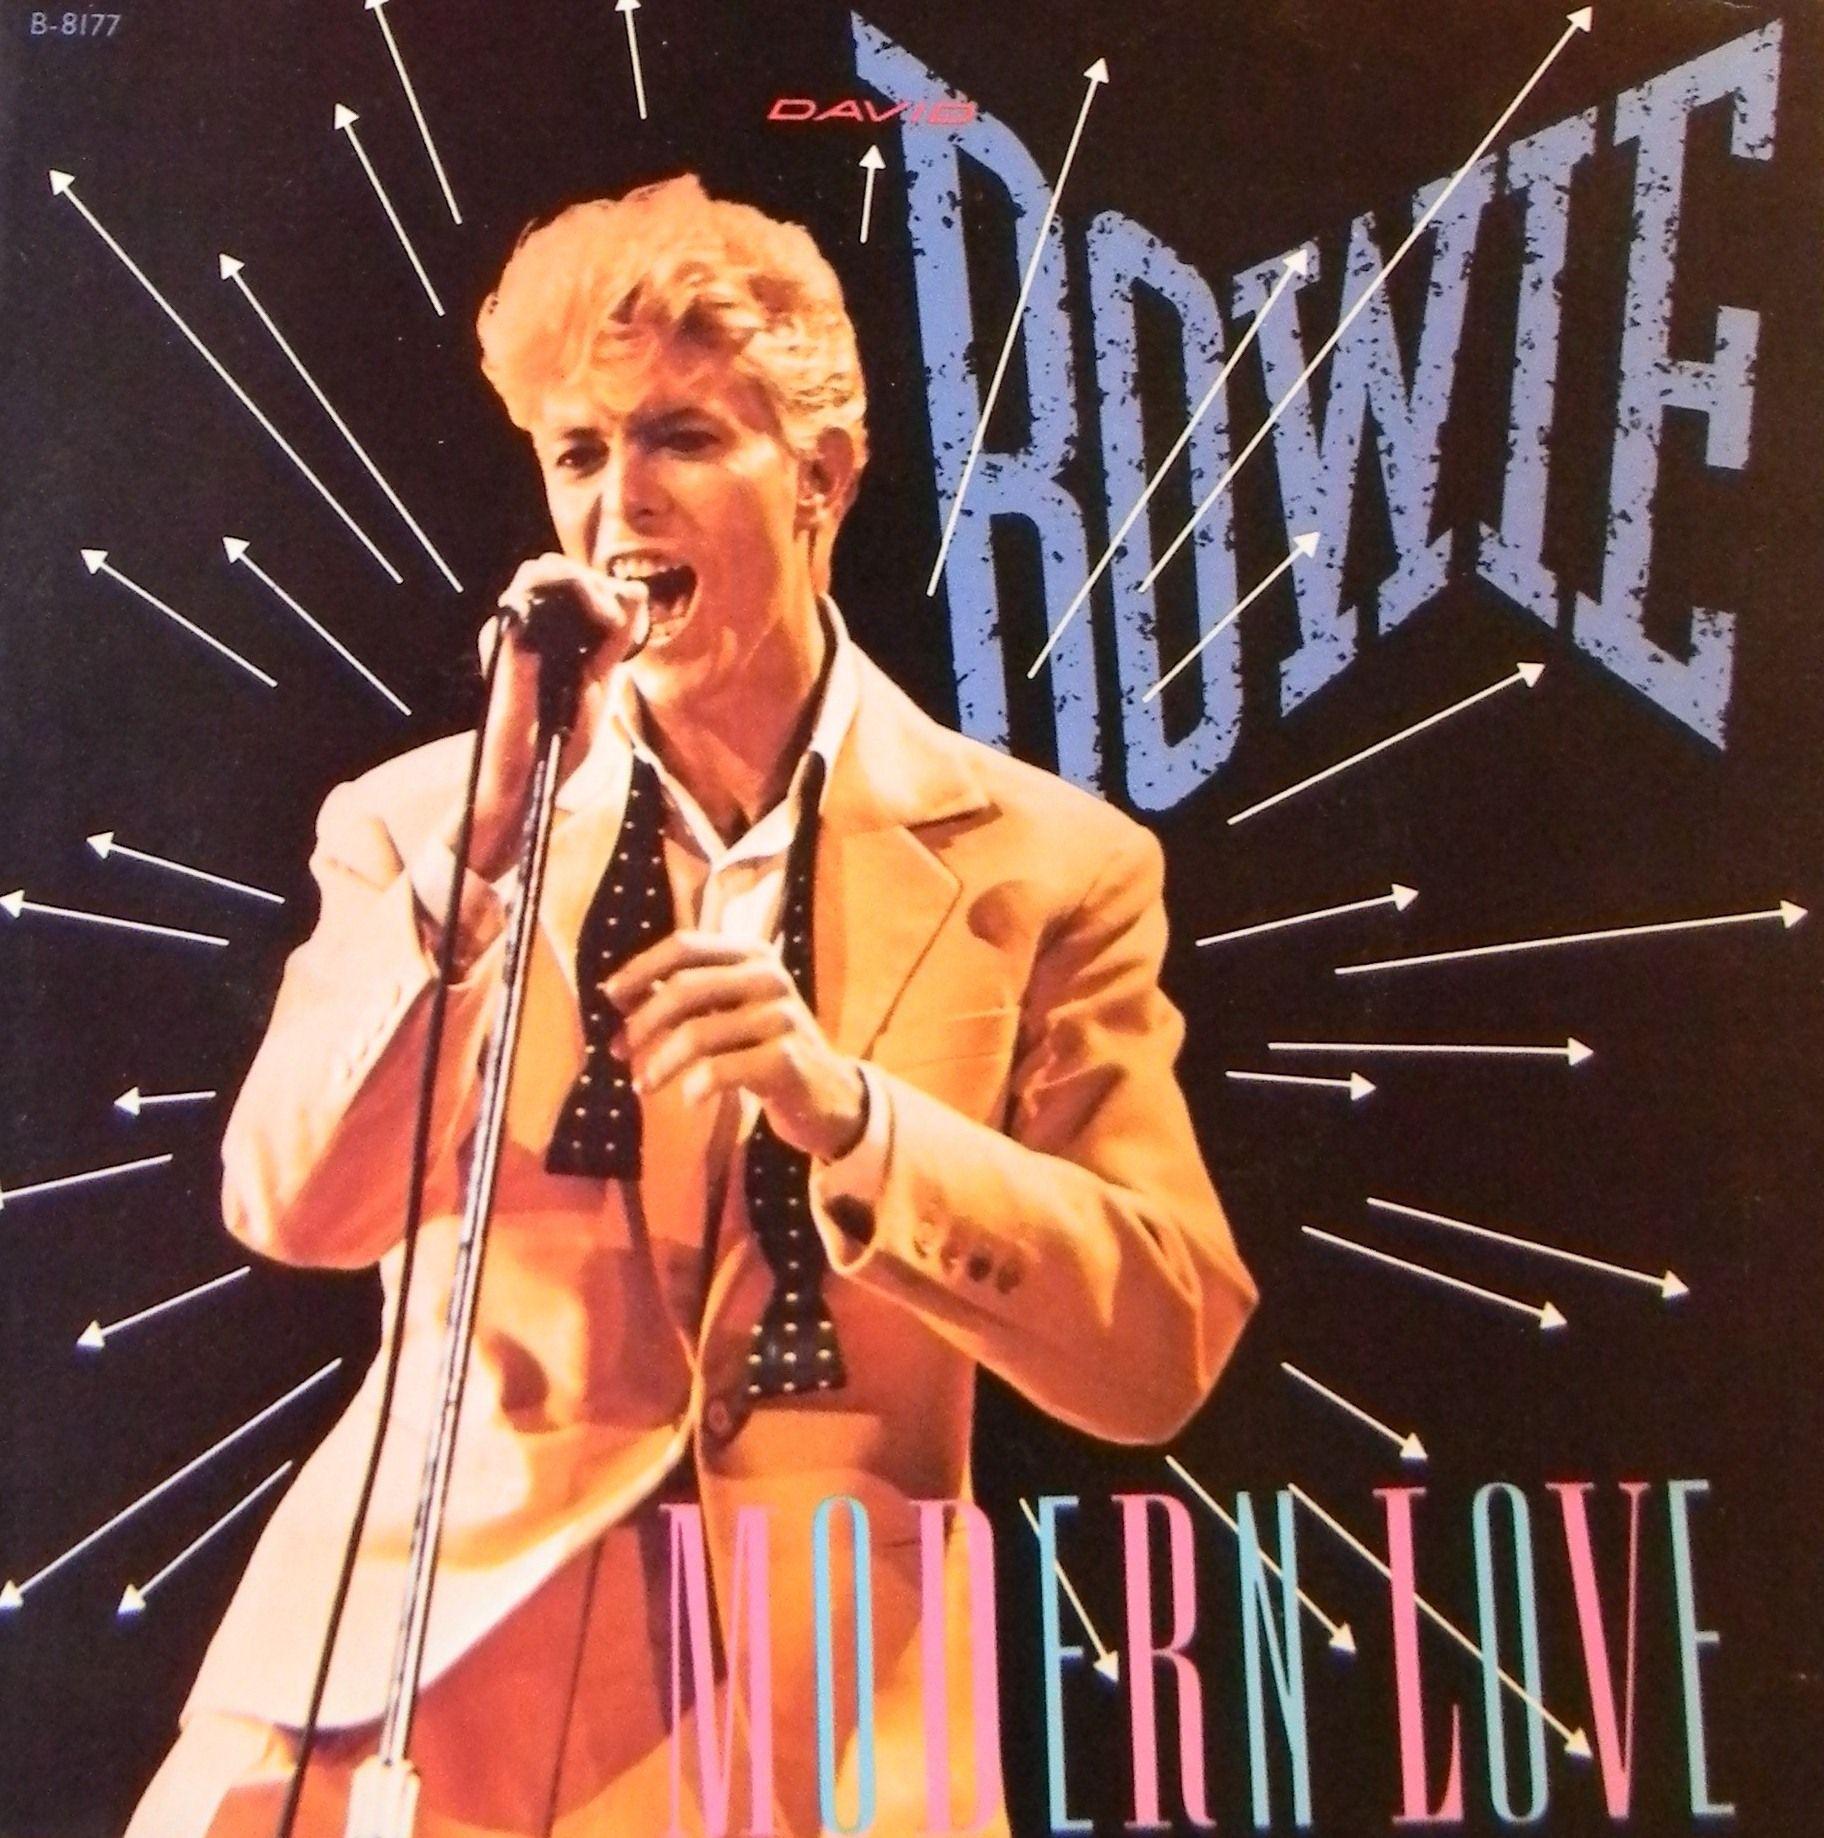 David Bowie Modern Love Picture Side 1 Modern Love Side 2 Modern Love Live 7 Single 45 Rpm Emi Records 1983 B David Bowie Bowie Discos De Vinilo